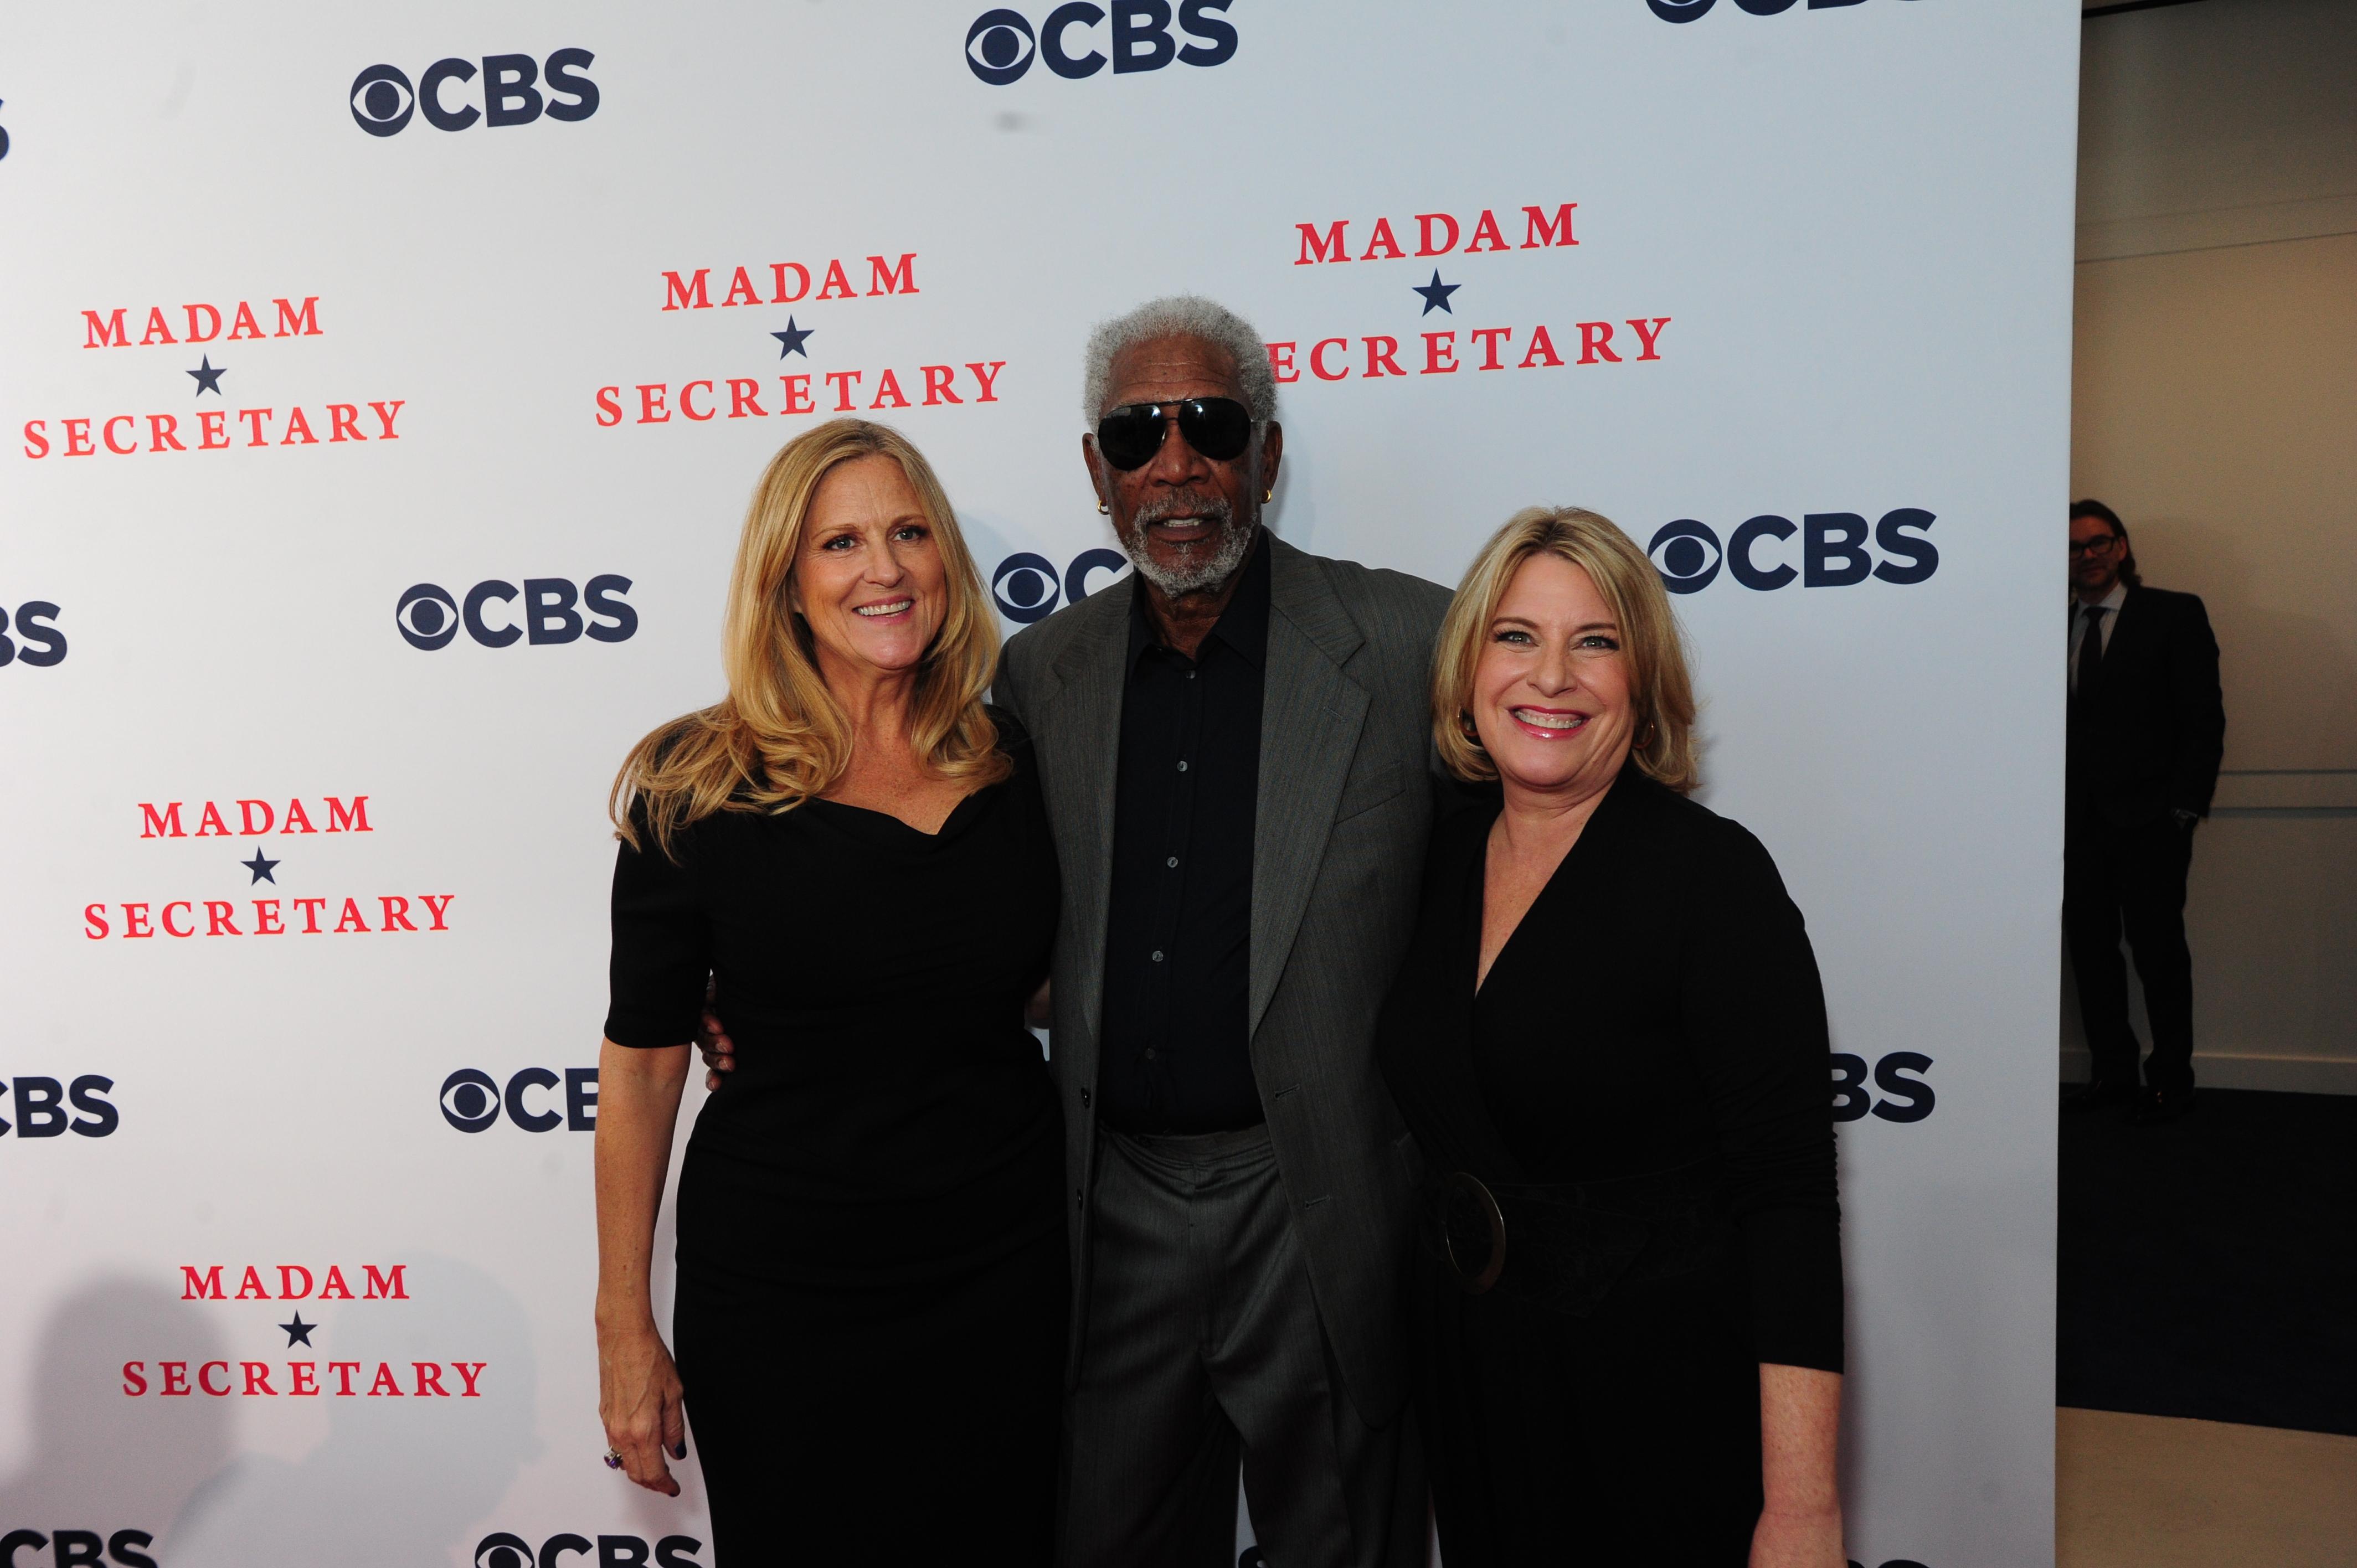 Executive Producers Lori McCreary, Morgan Freeman and Barbara Hall